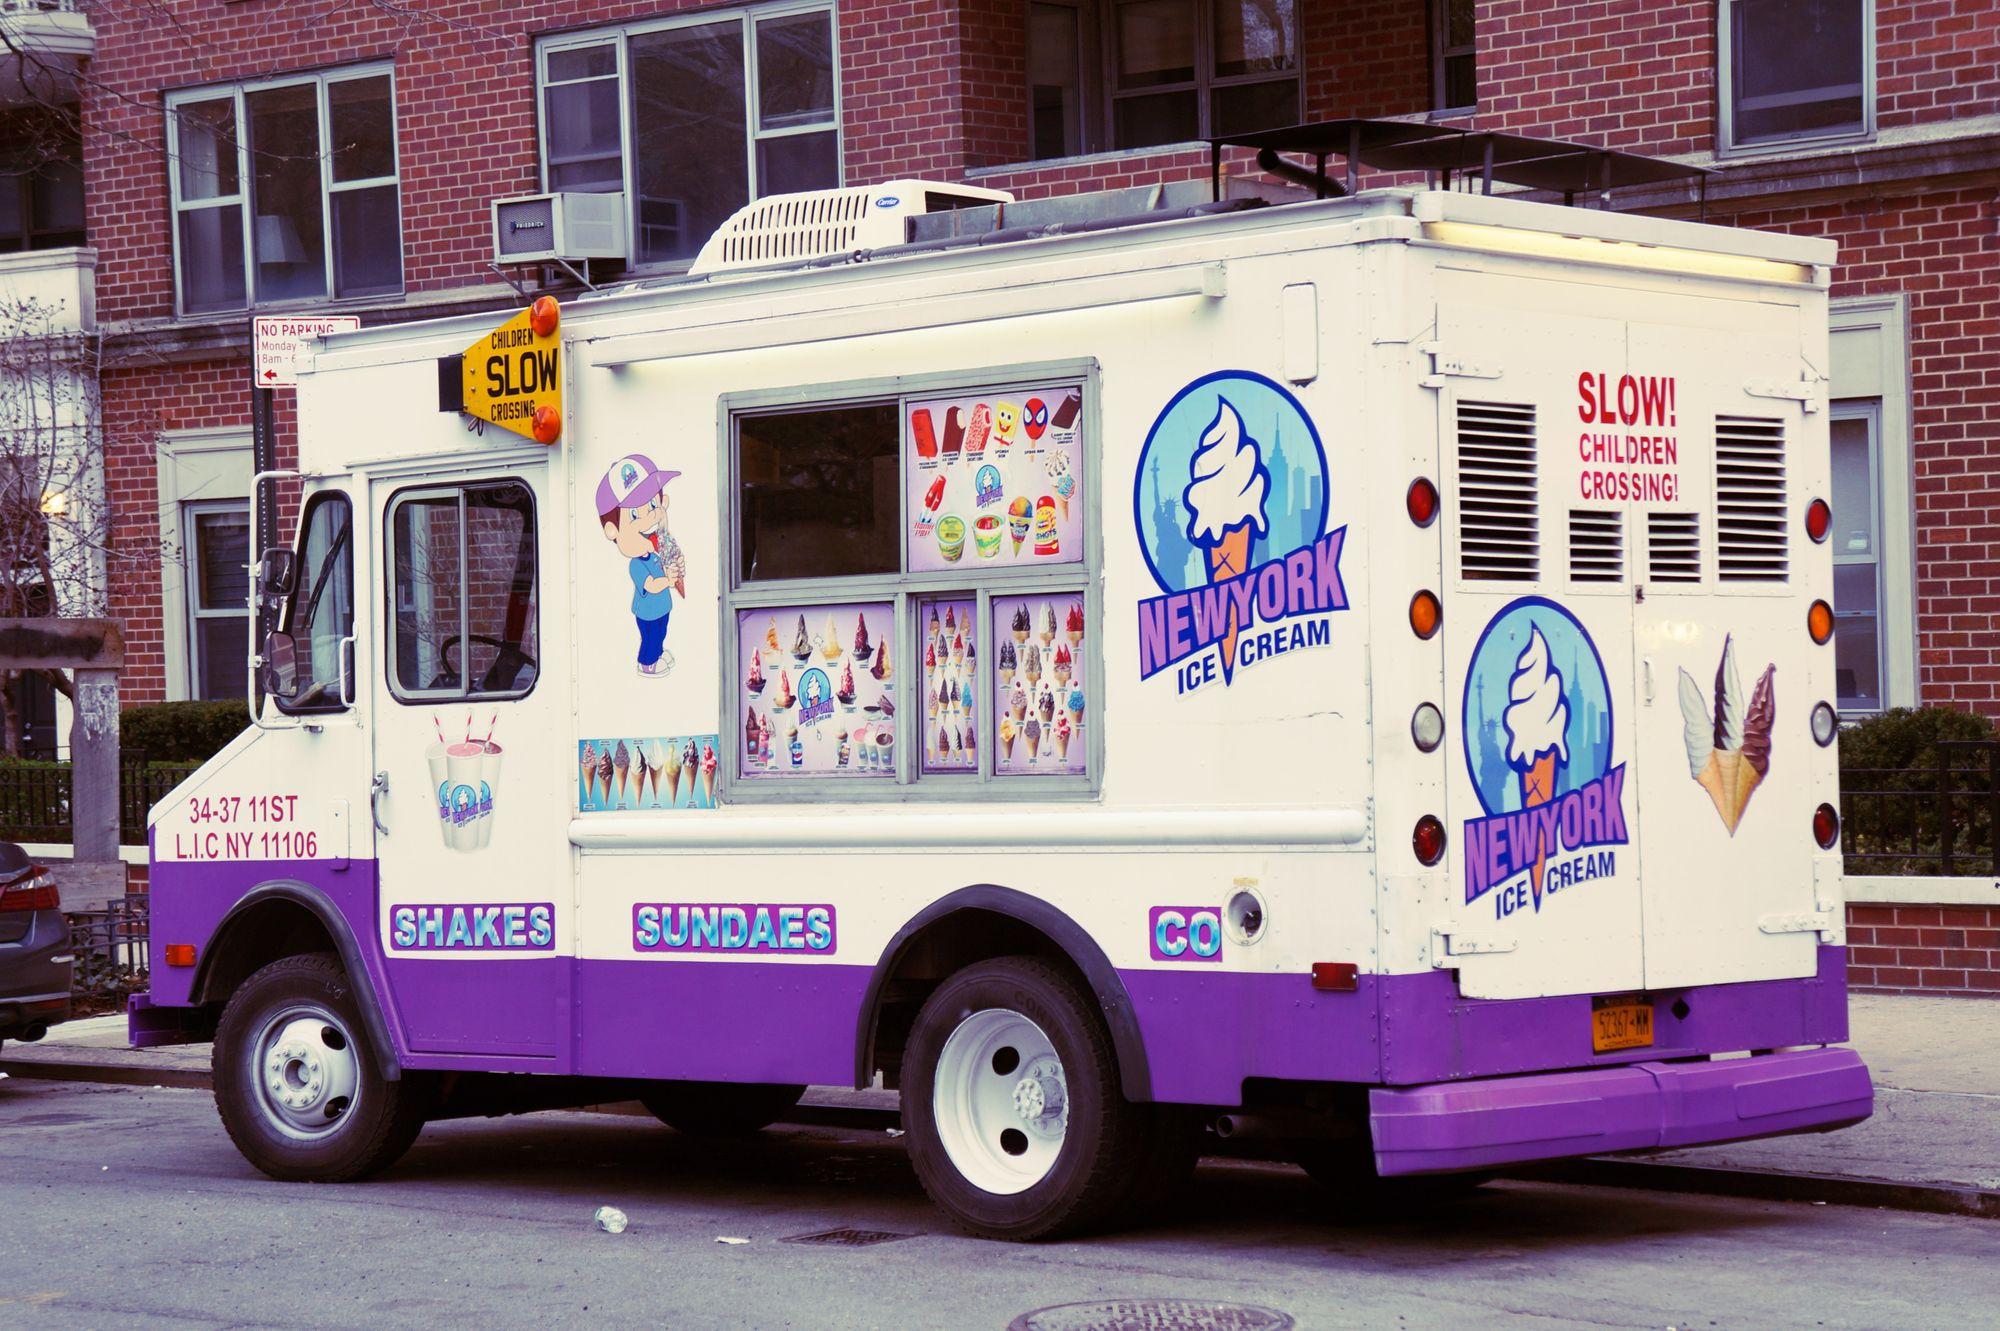 New York Ice Cream